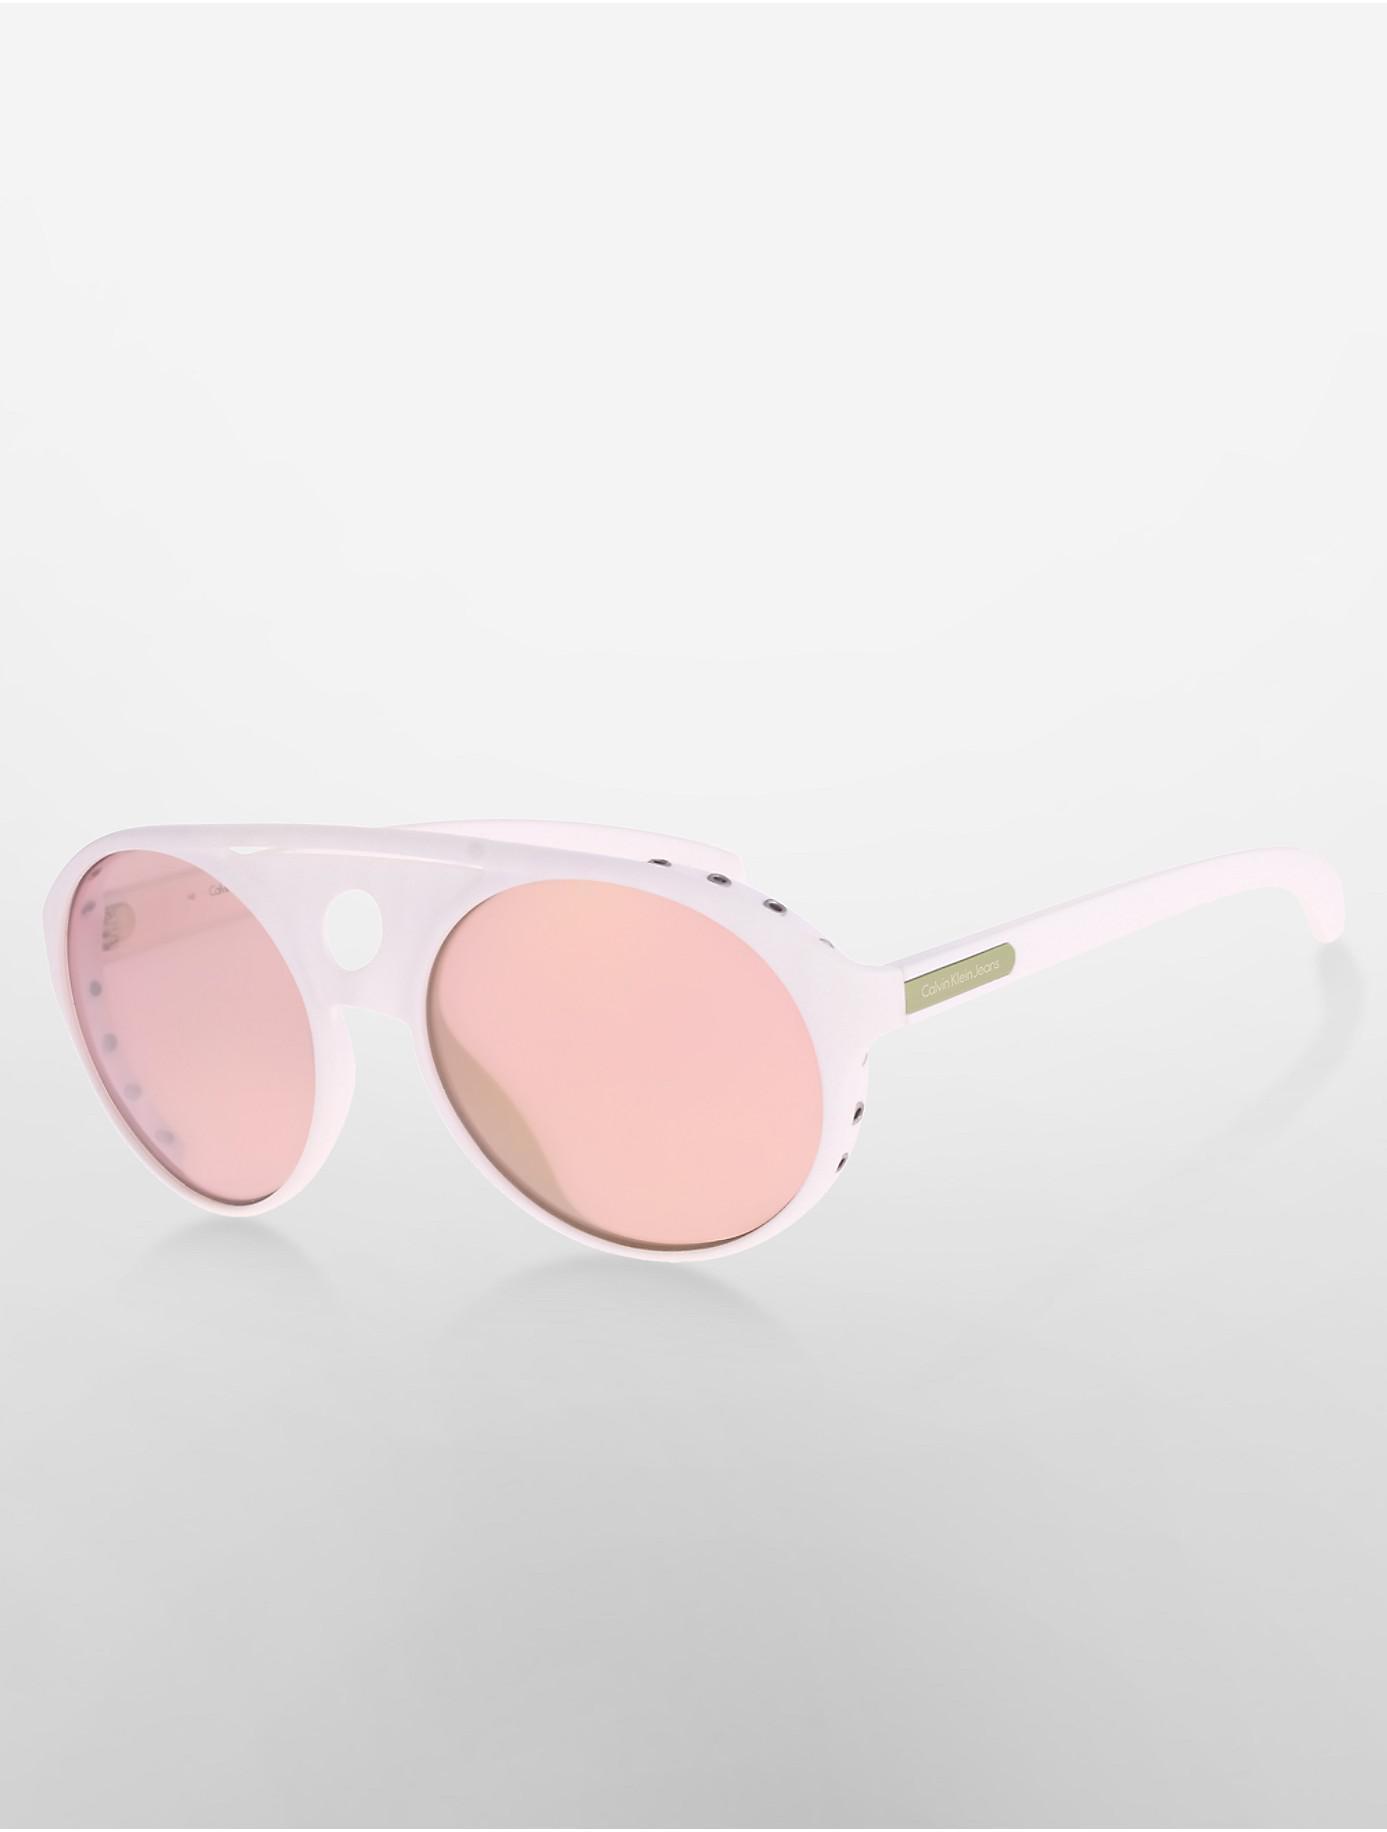 2111114dd8abd Lyst - Calvin Klein 205W39Nyc Jeans Aviator Sunglasses in White ...